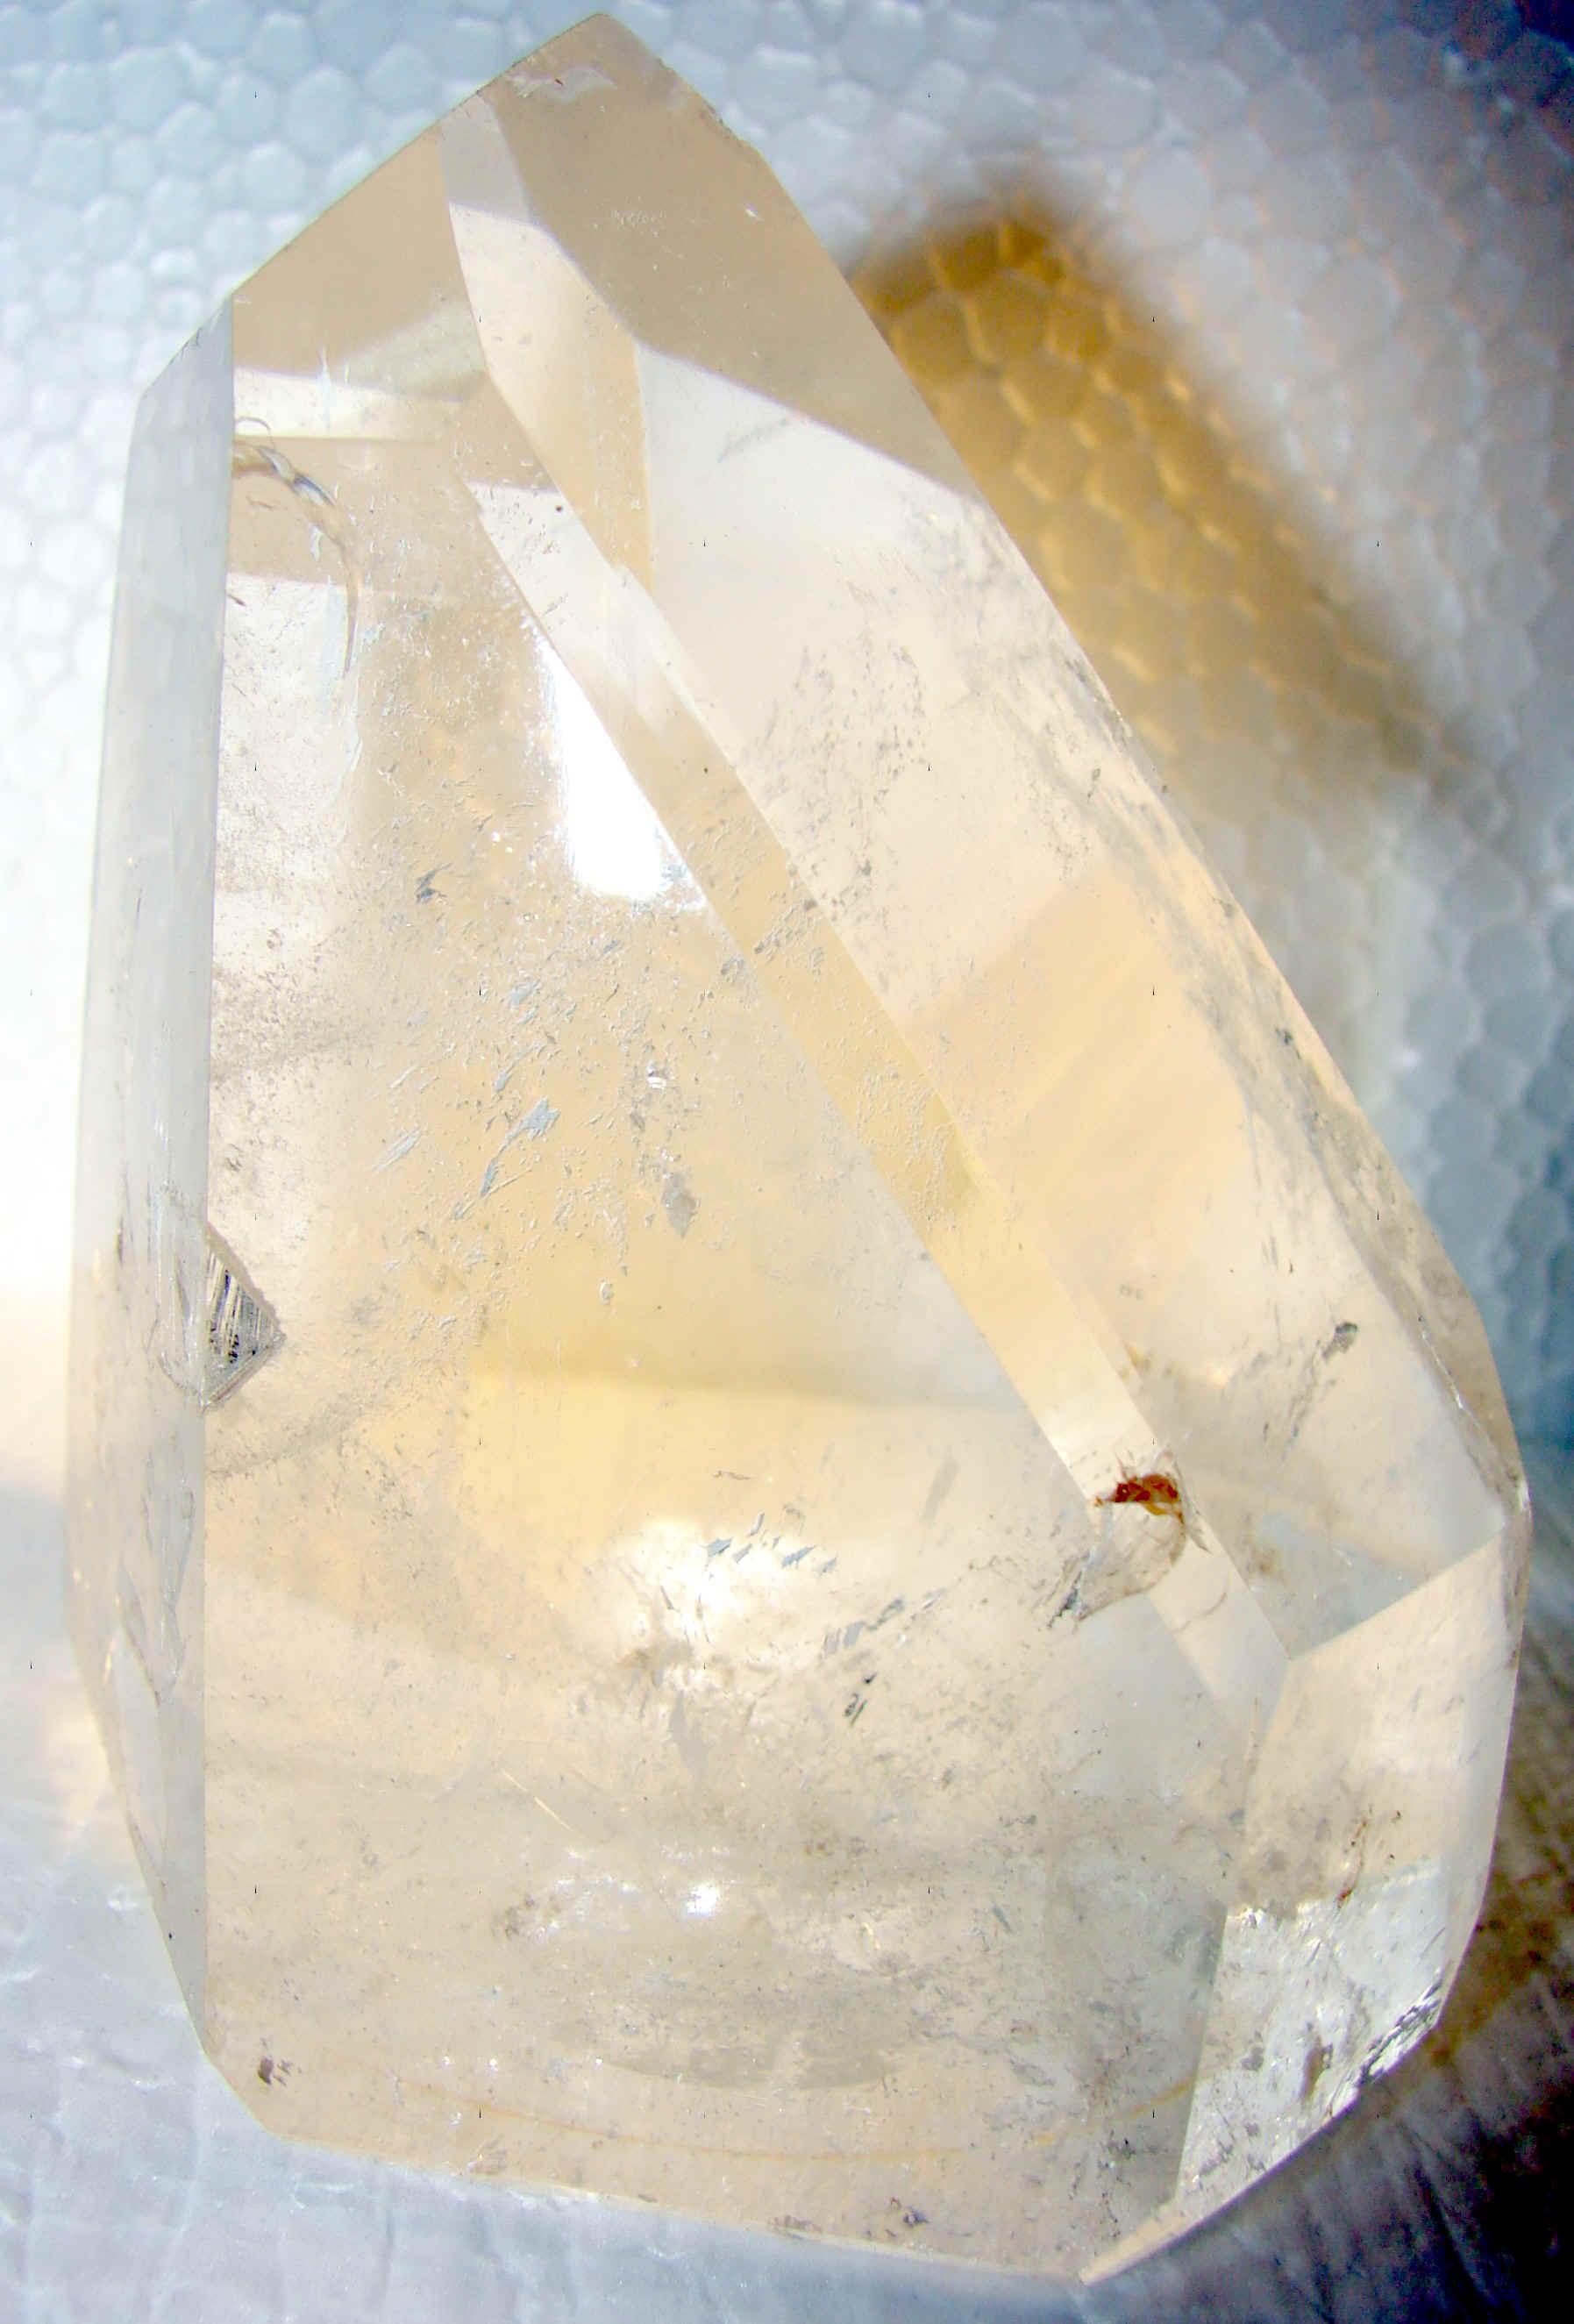 http://www.quartzcrystals.net/nuxl-17.jpg (807370 bytes)